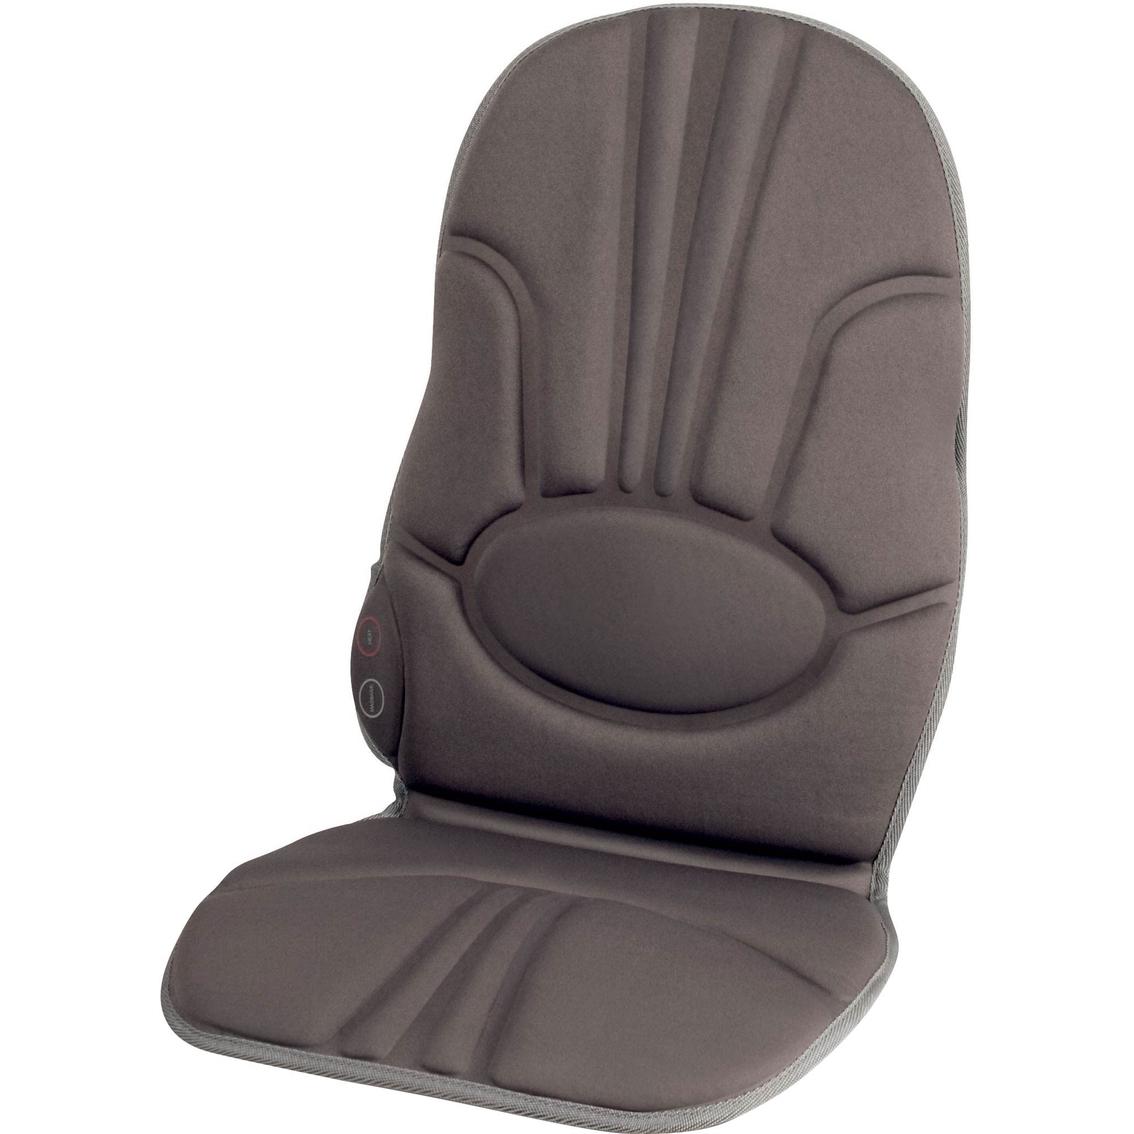 Homedics Portable Back Massage Cushion With Heat Massagers